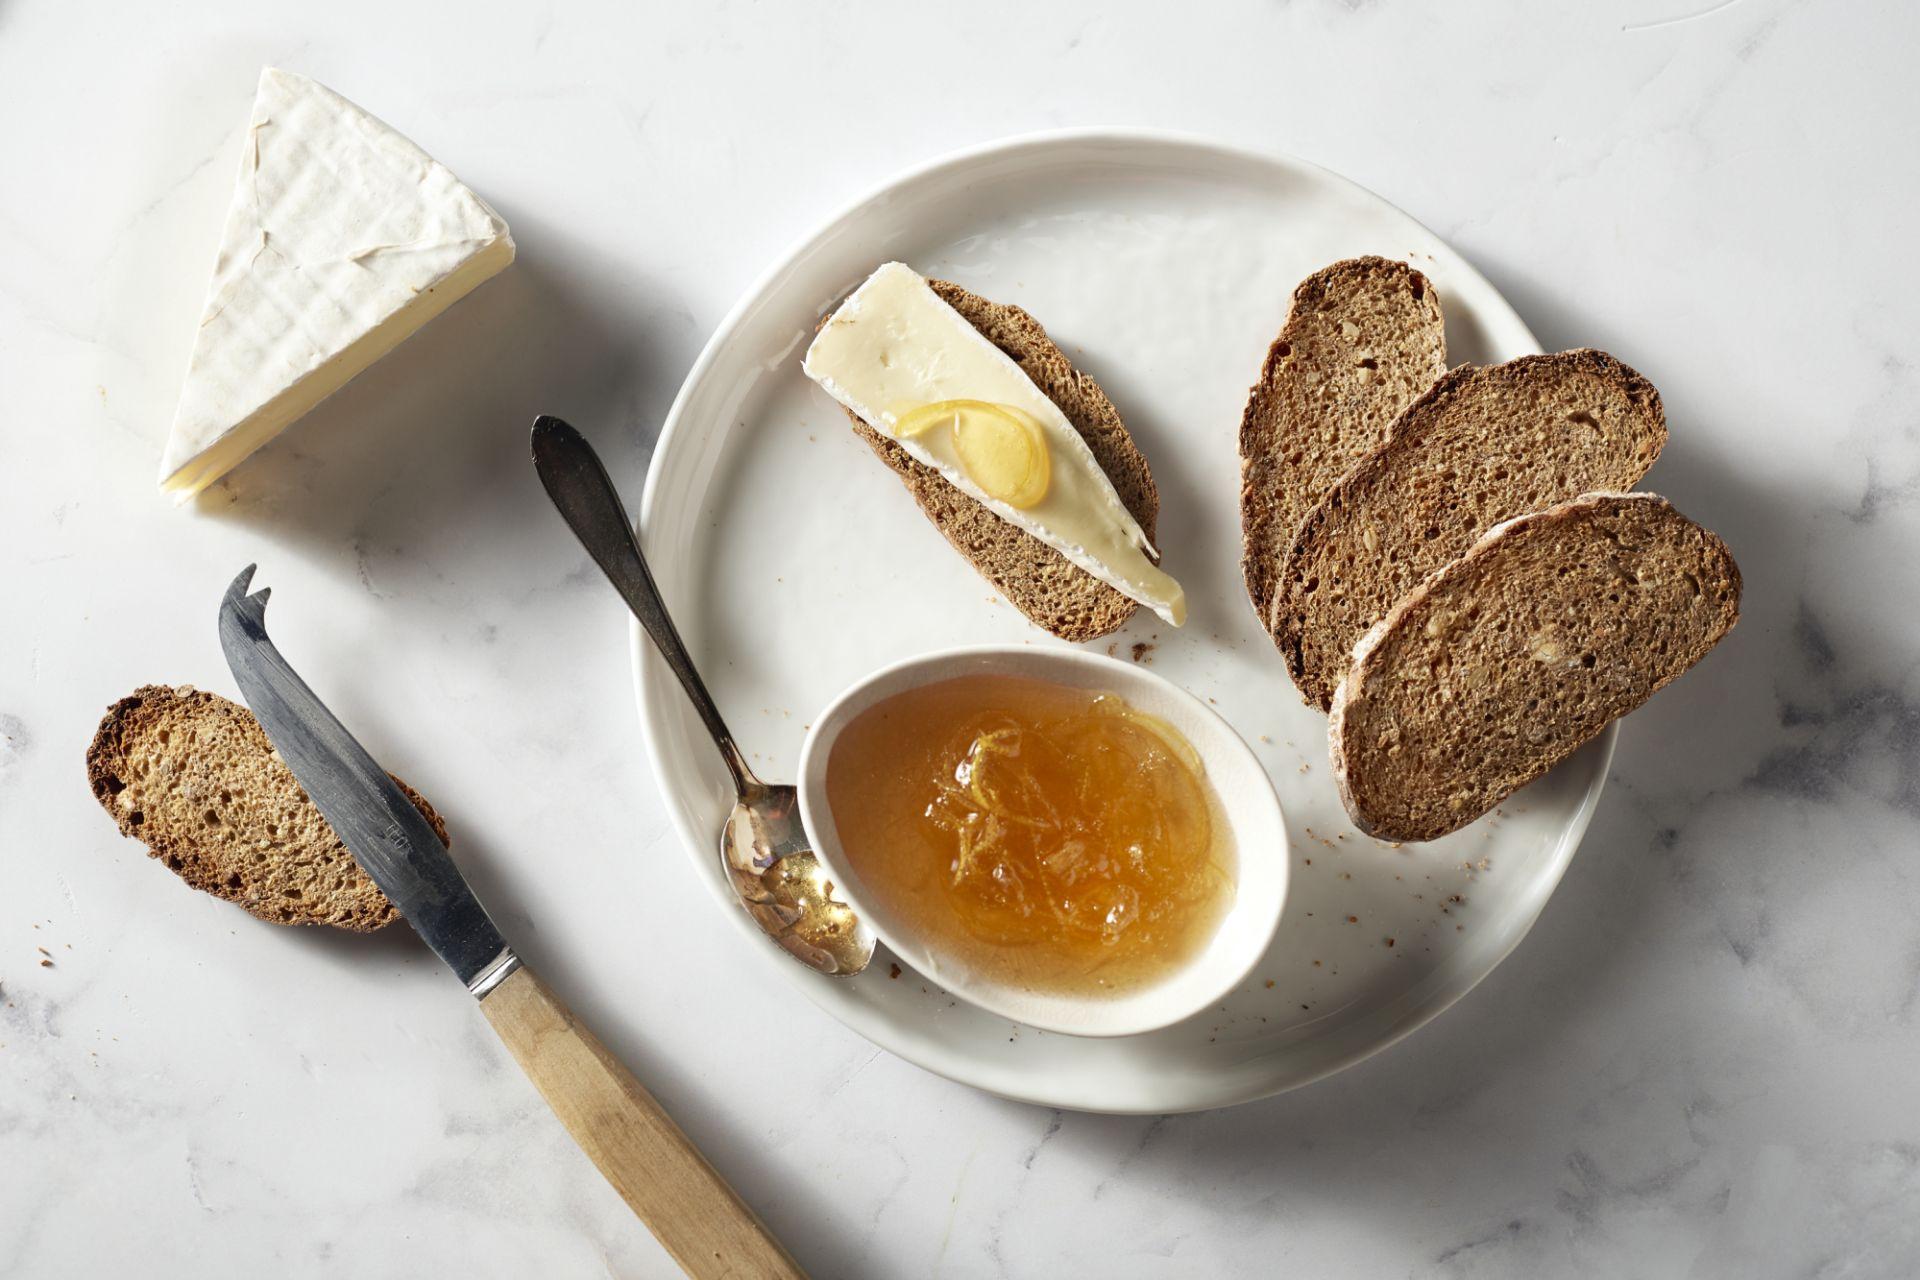 Griekse citroenmarmelade